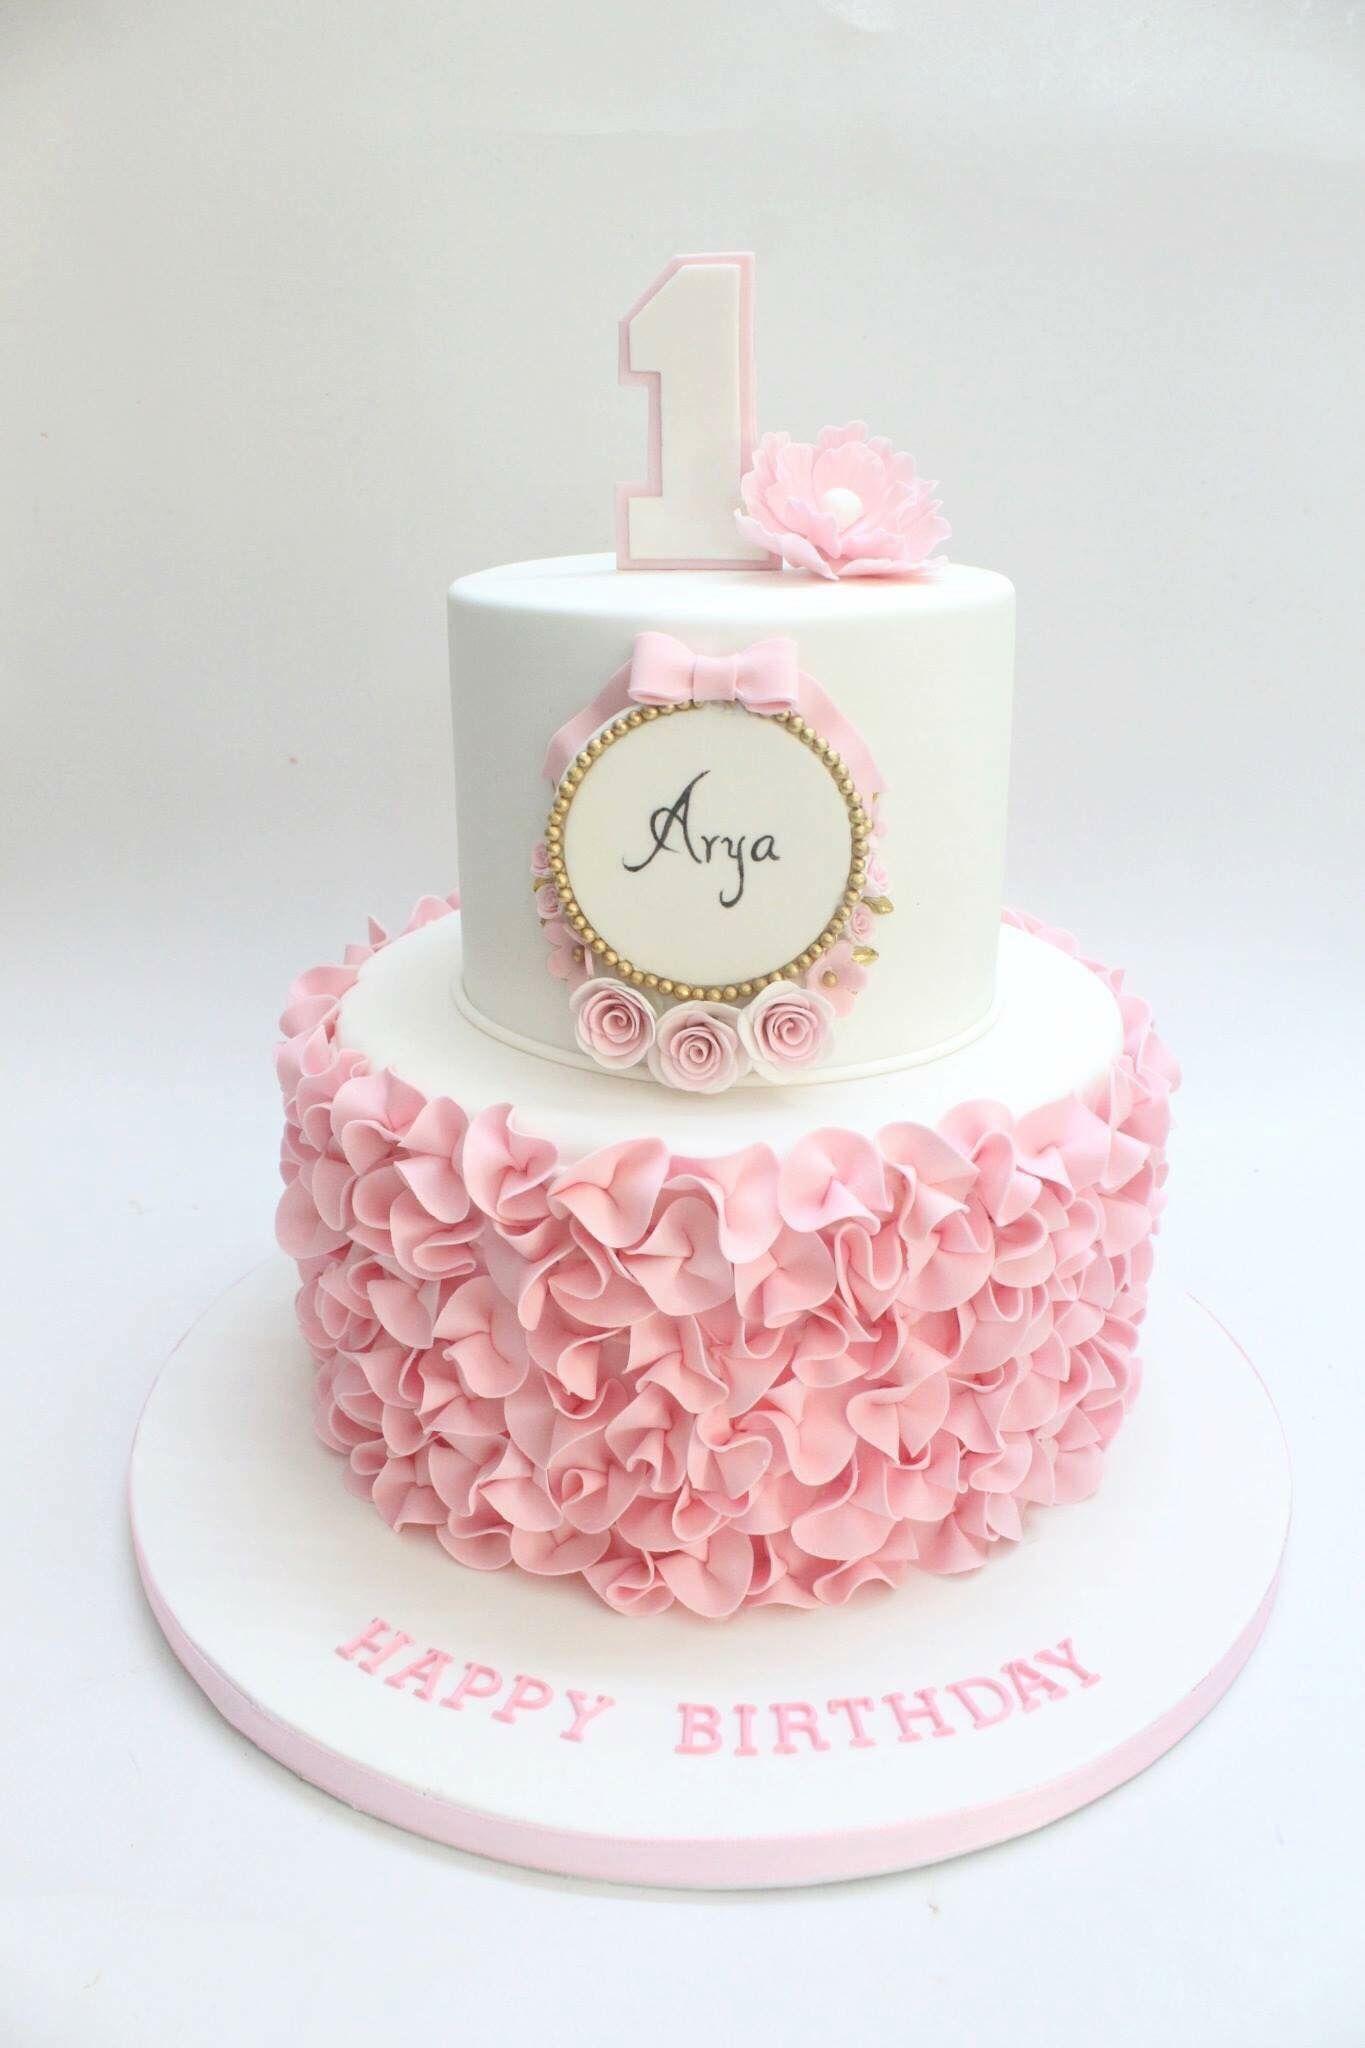 Pin By Navya On Cakes Baby Birthday Cakes Birthday Cake Girls